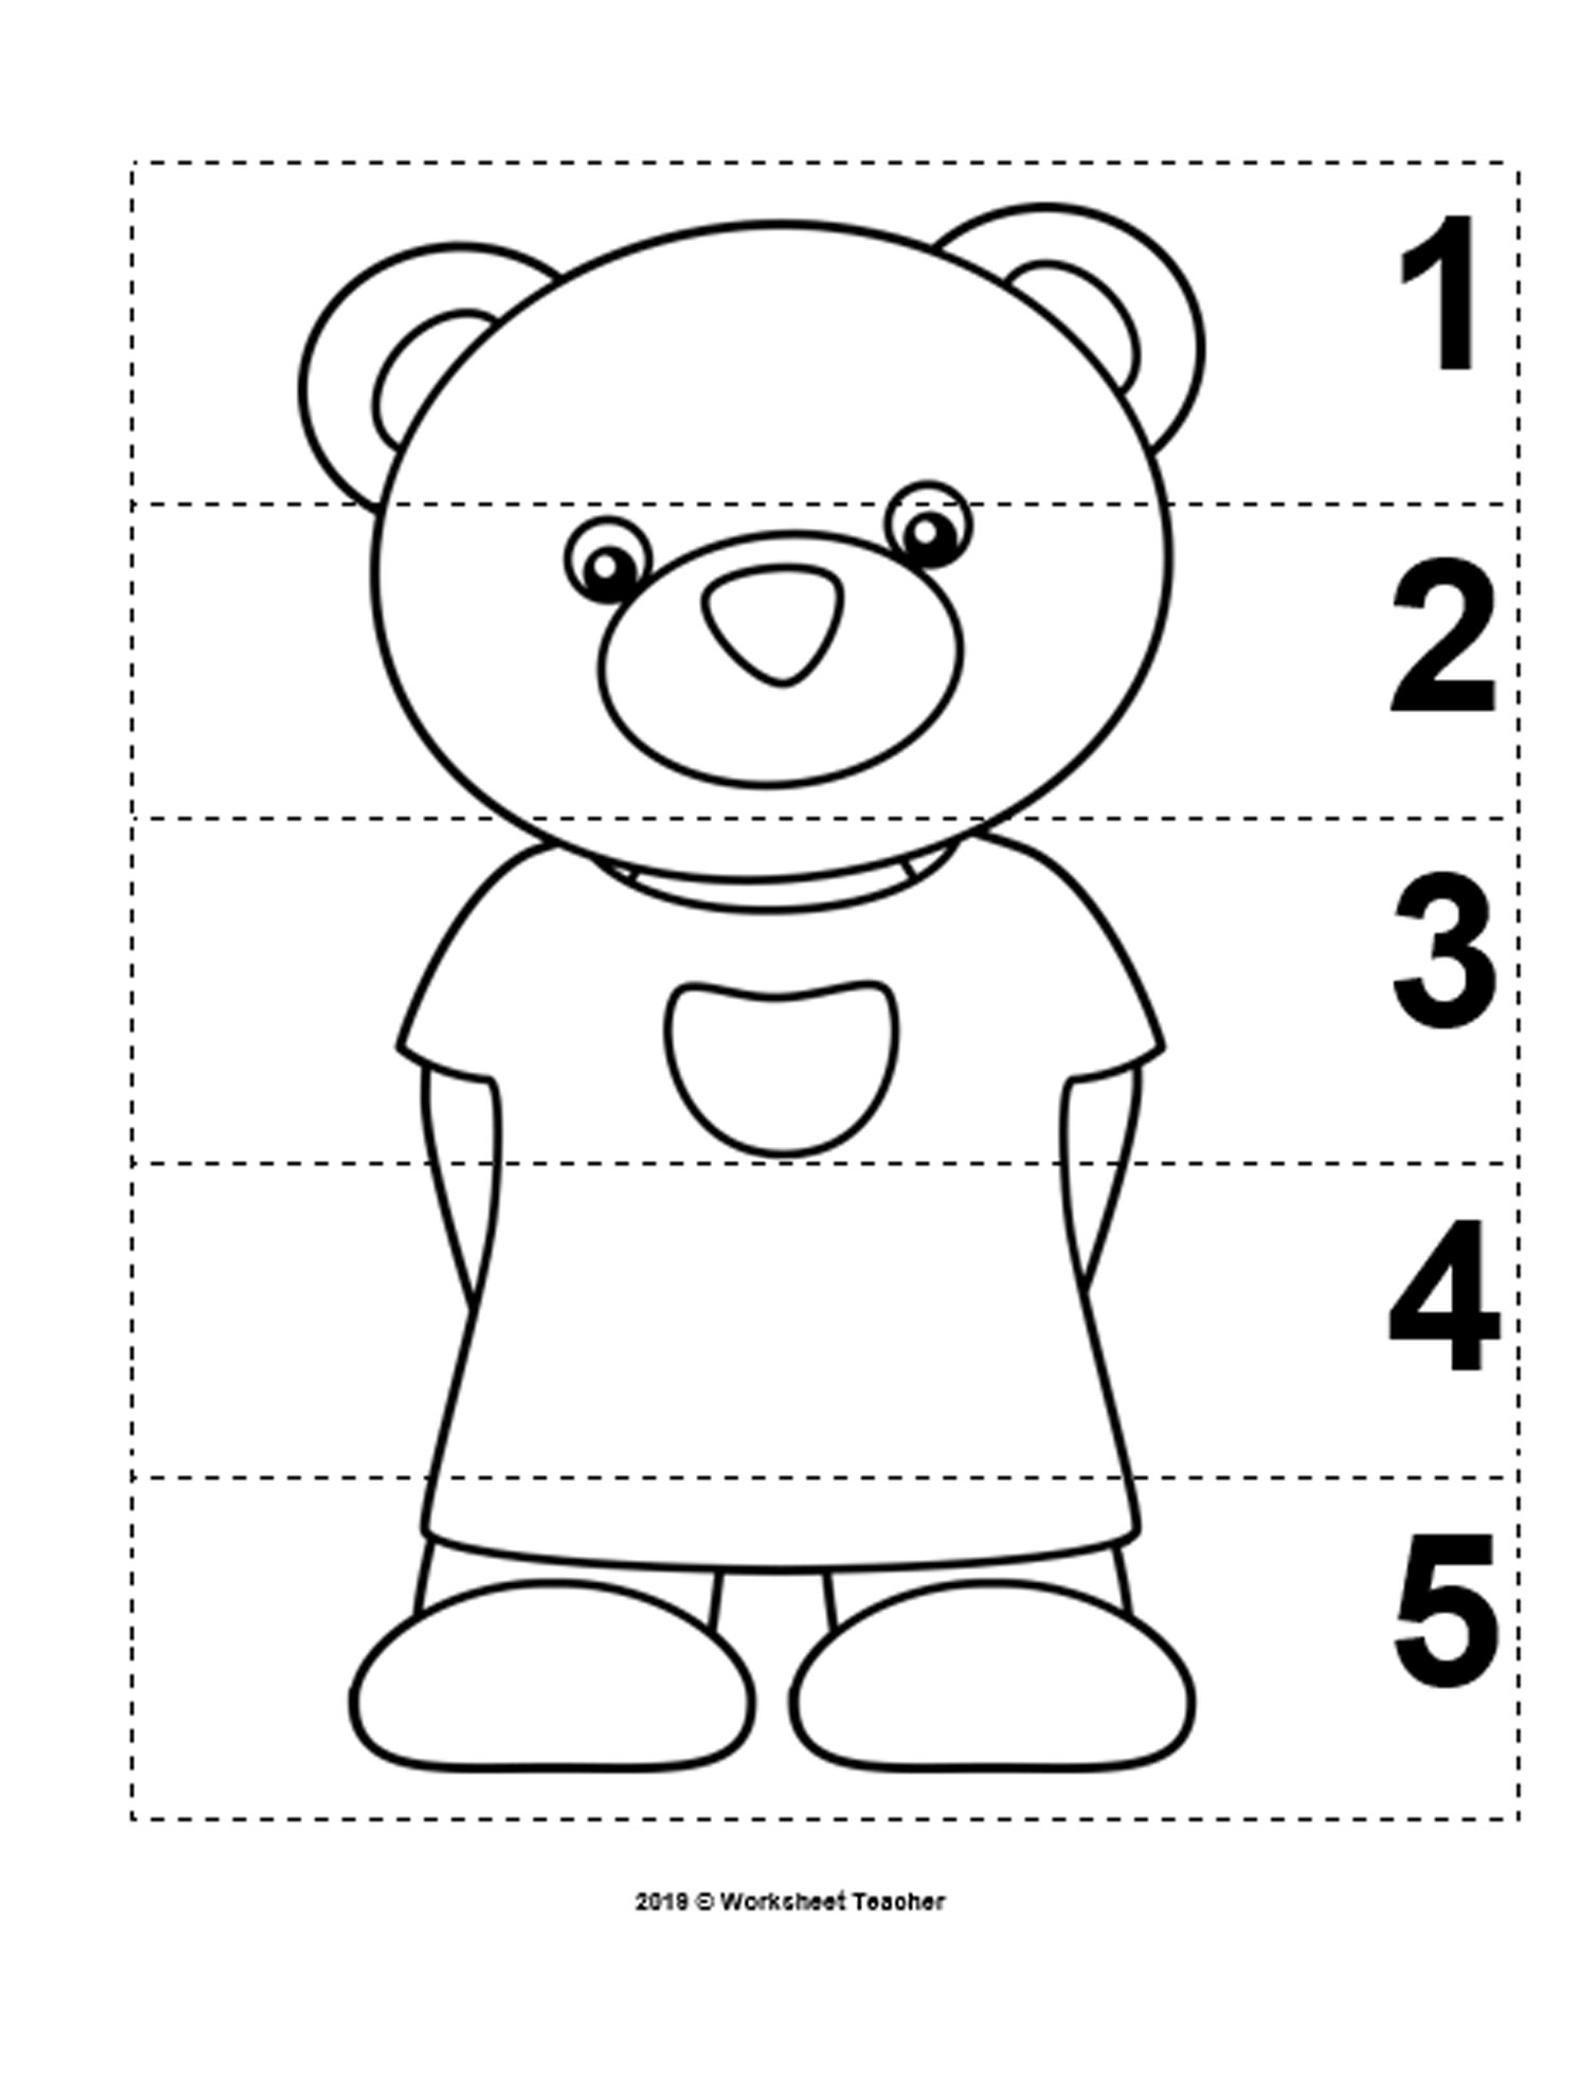 Bear Worksheets For Kindergarten Worksheets Are An Important Part Of Researchi In 2021 Bears Preschool Goldilocks And The Three Bears Preschool Curriculum Activities Bear worksheets for kindergarten